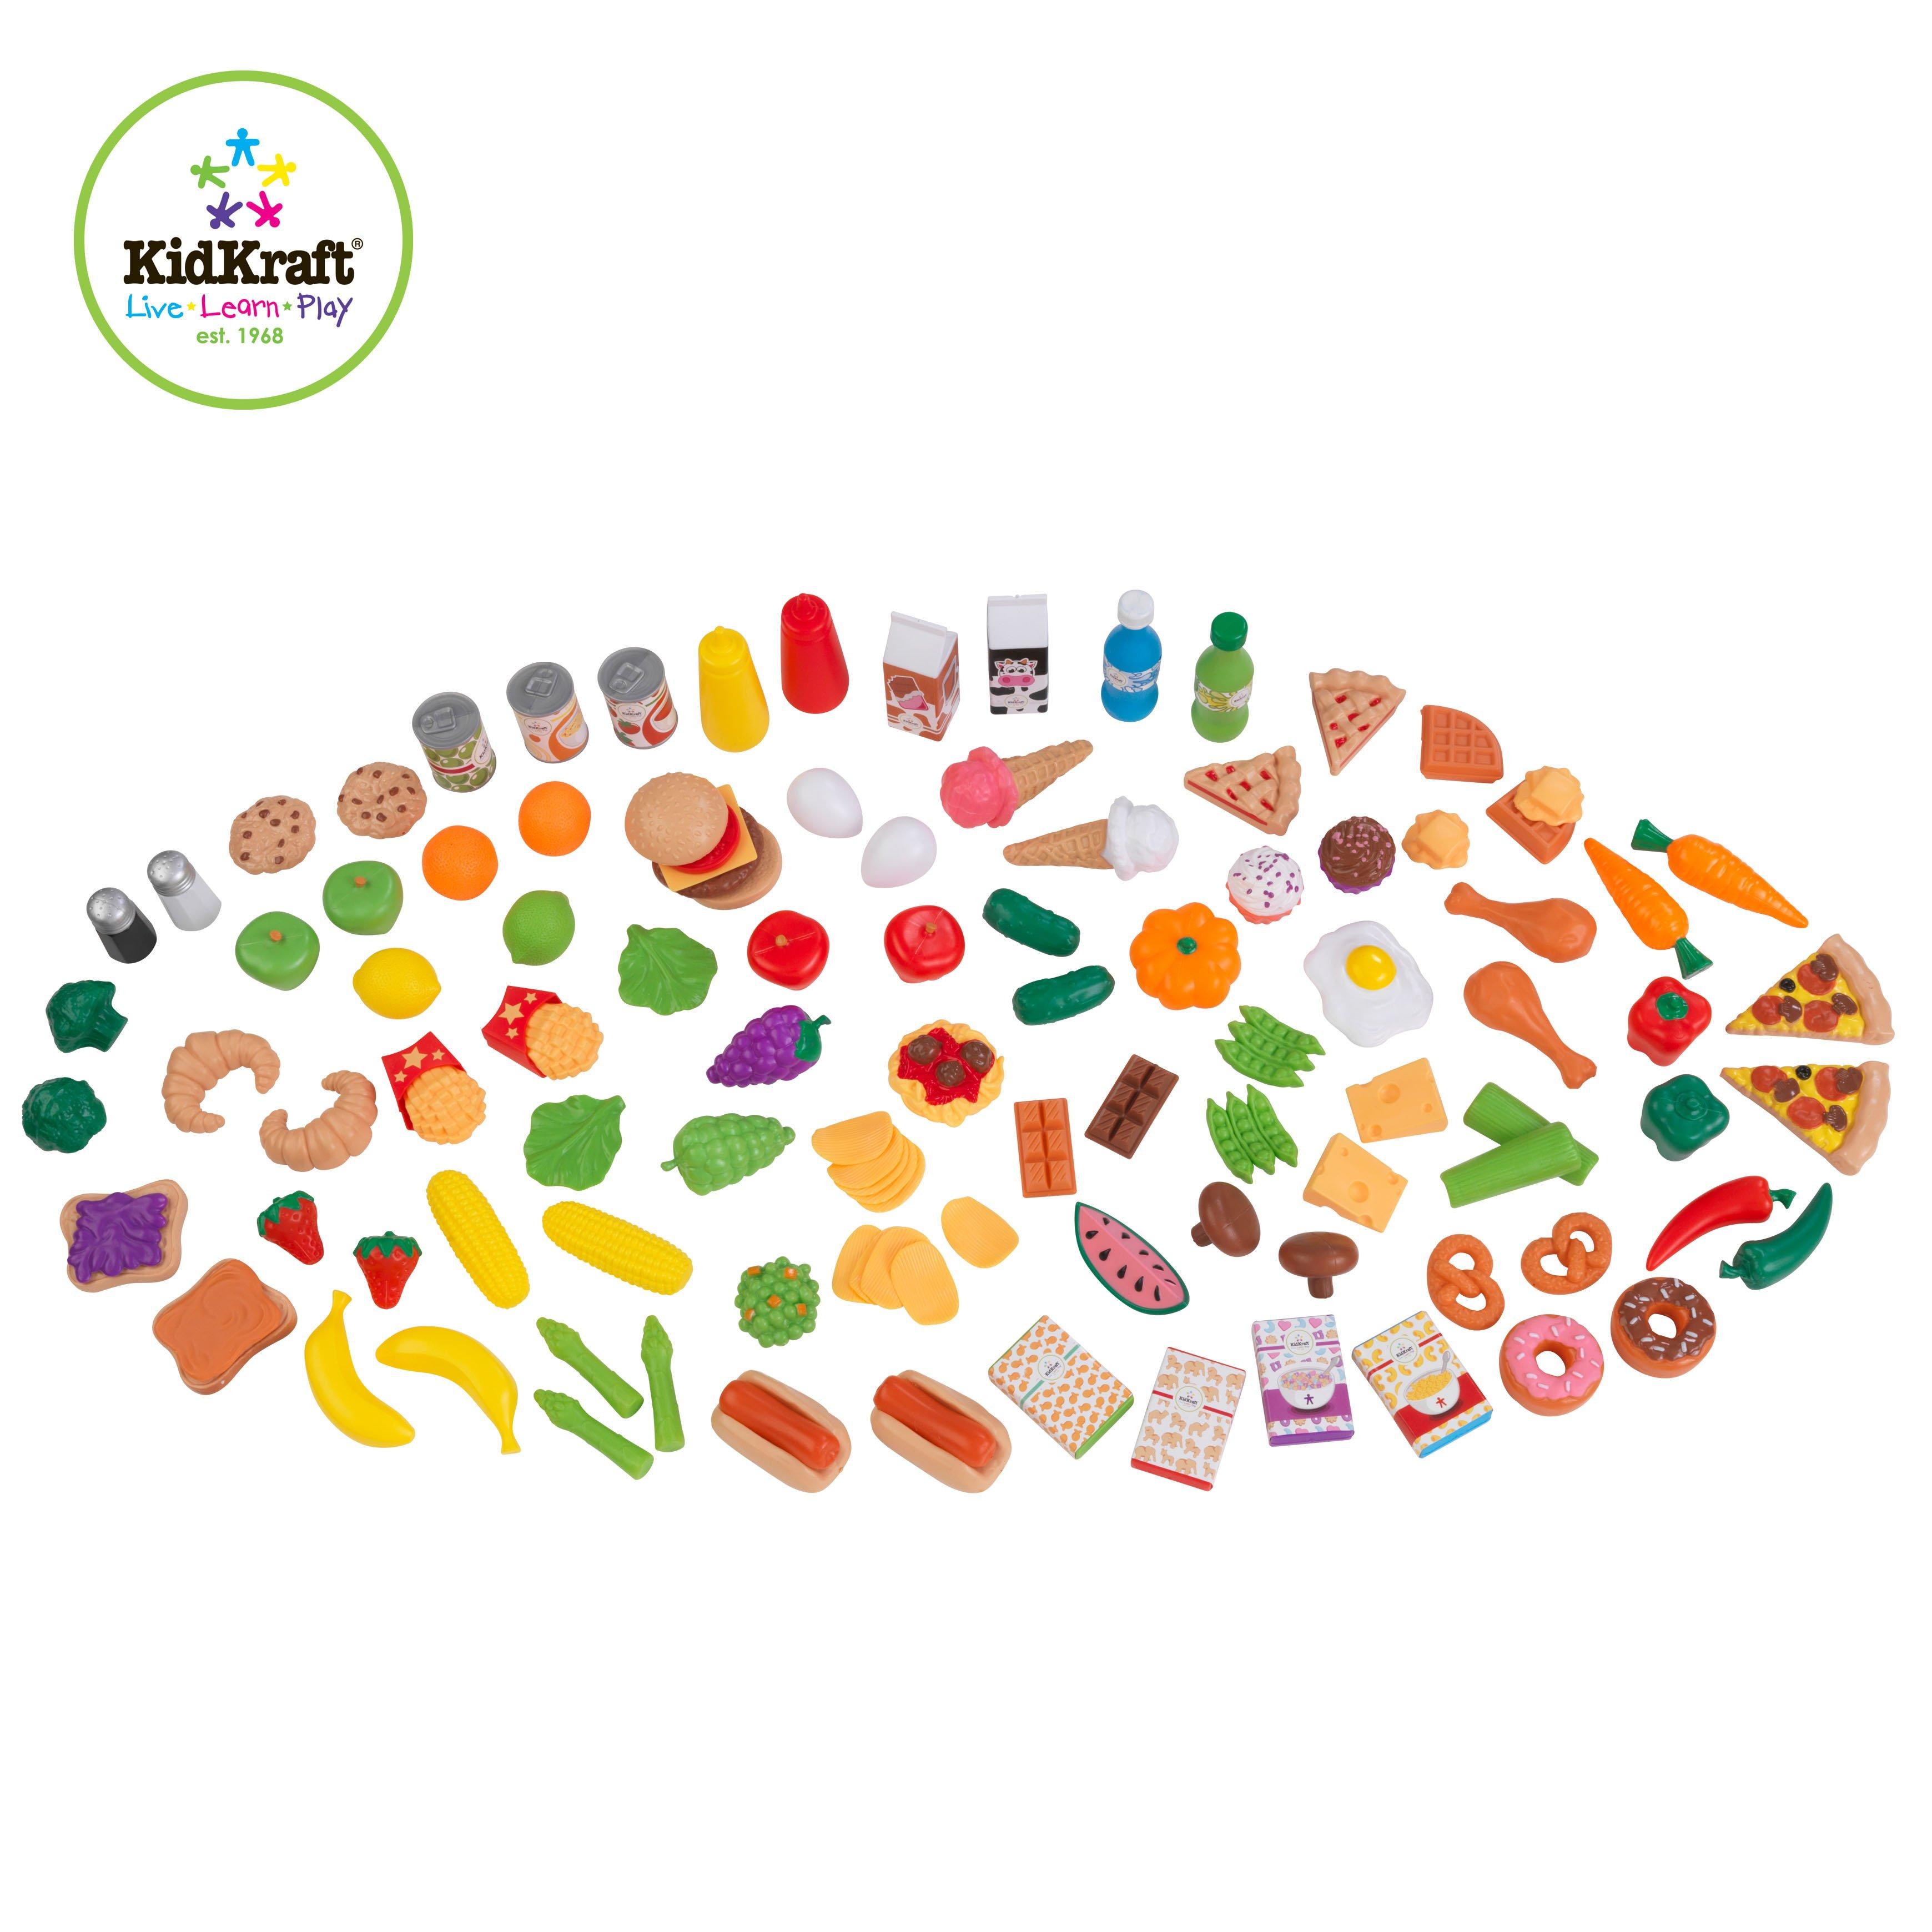 Kidkraft Deluxe Tasty Treat Pretend Food Playset